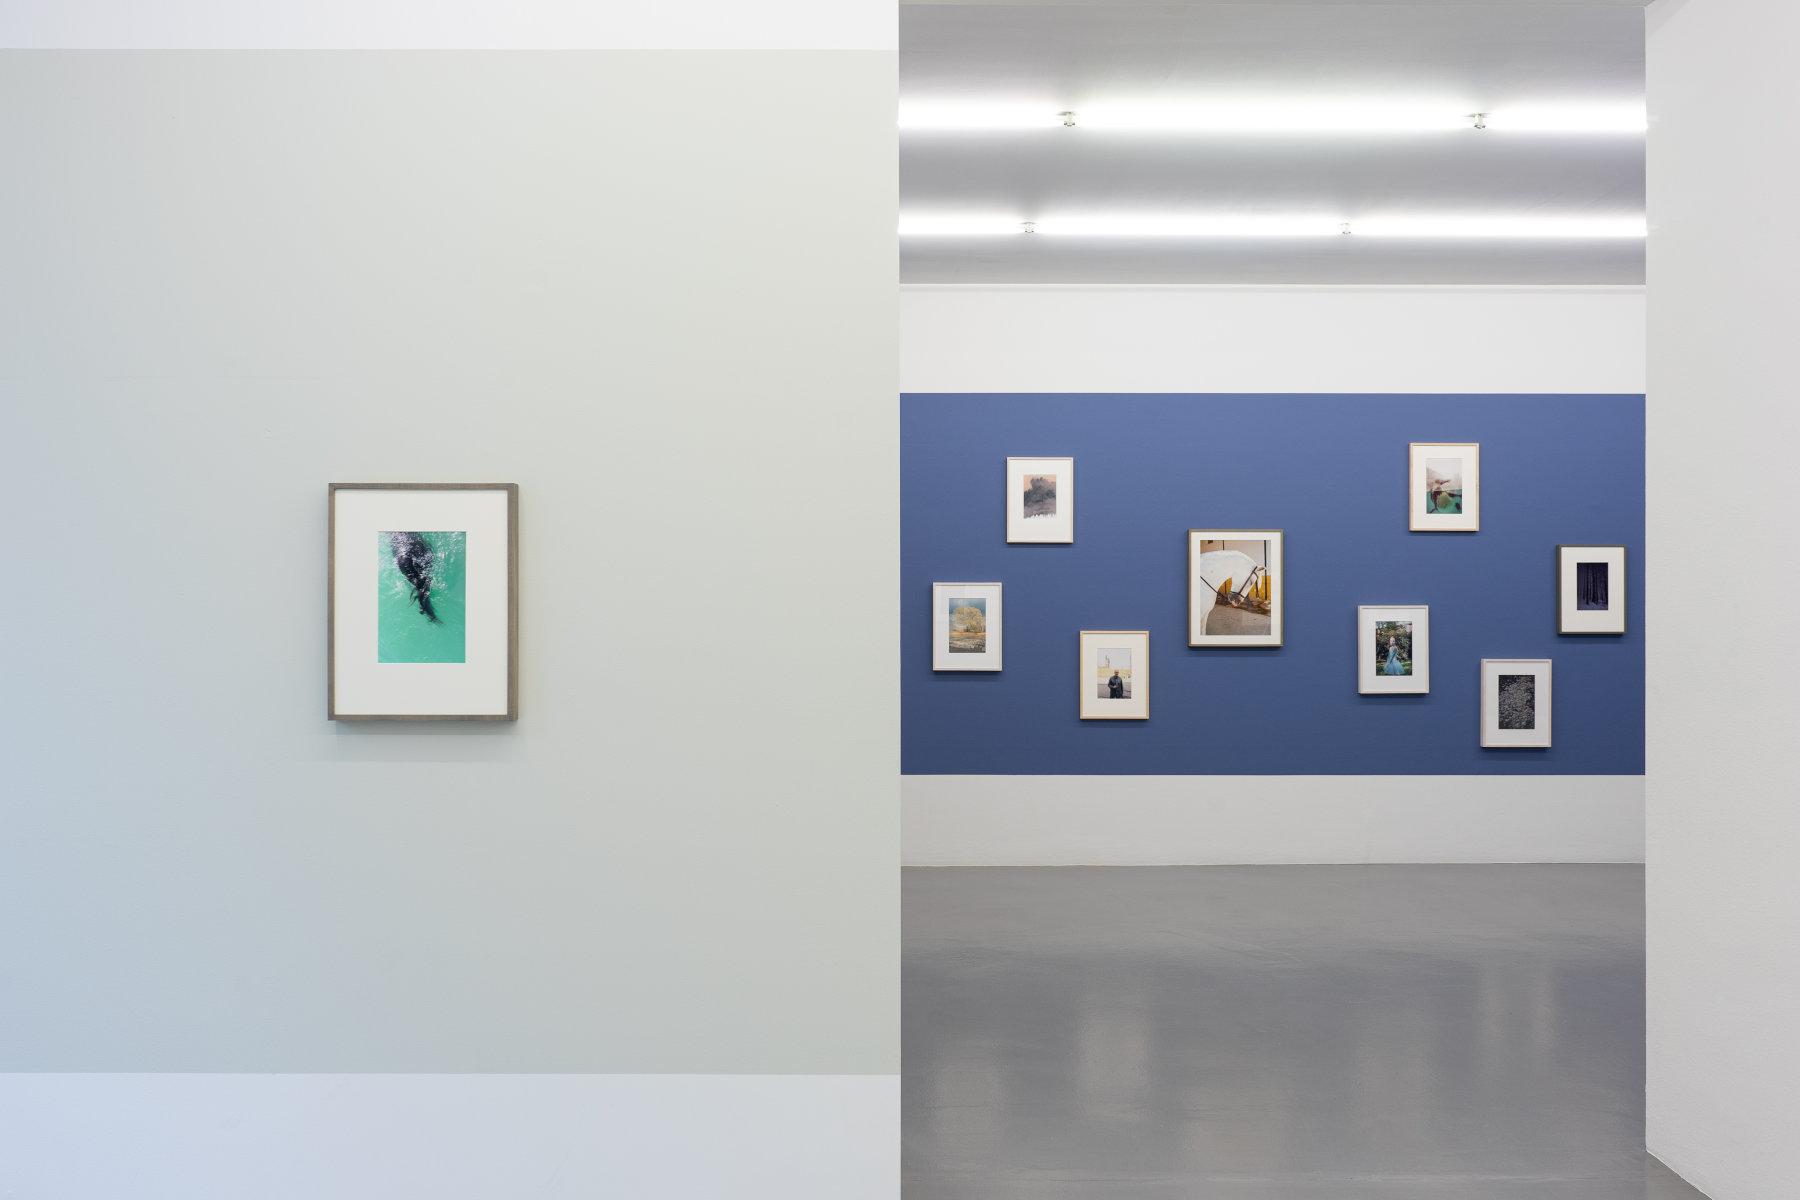 Mai 36 Galerie Jitka Hanzlova 1